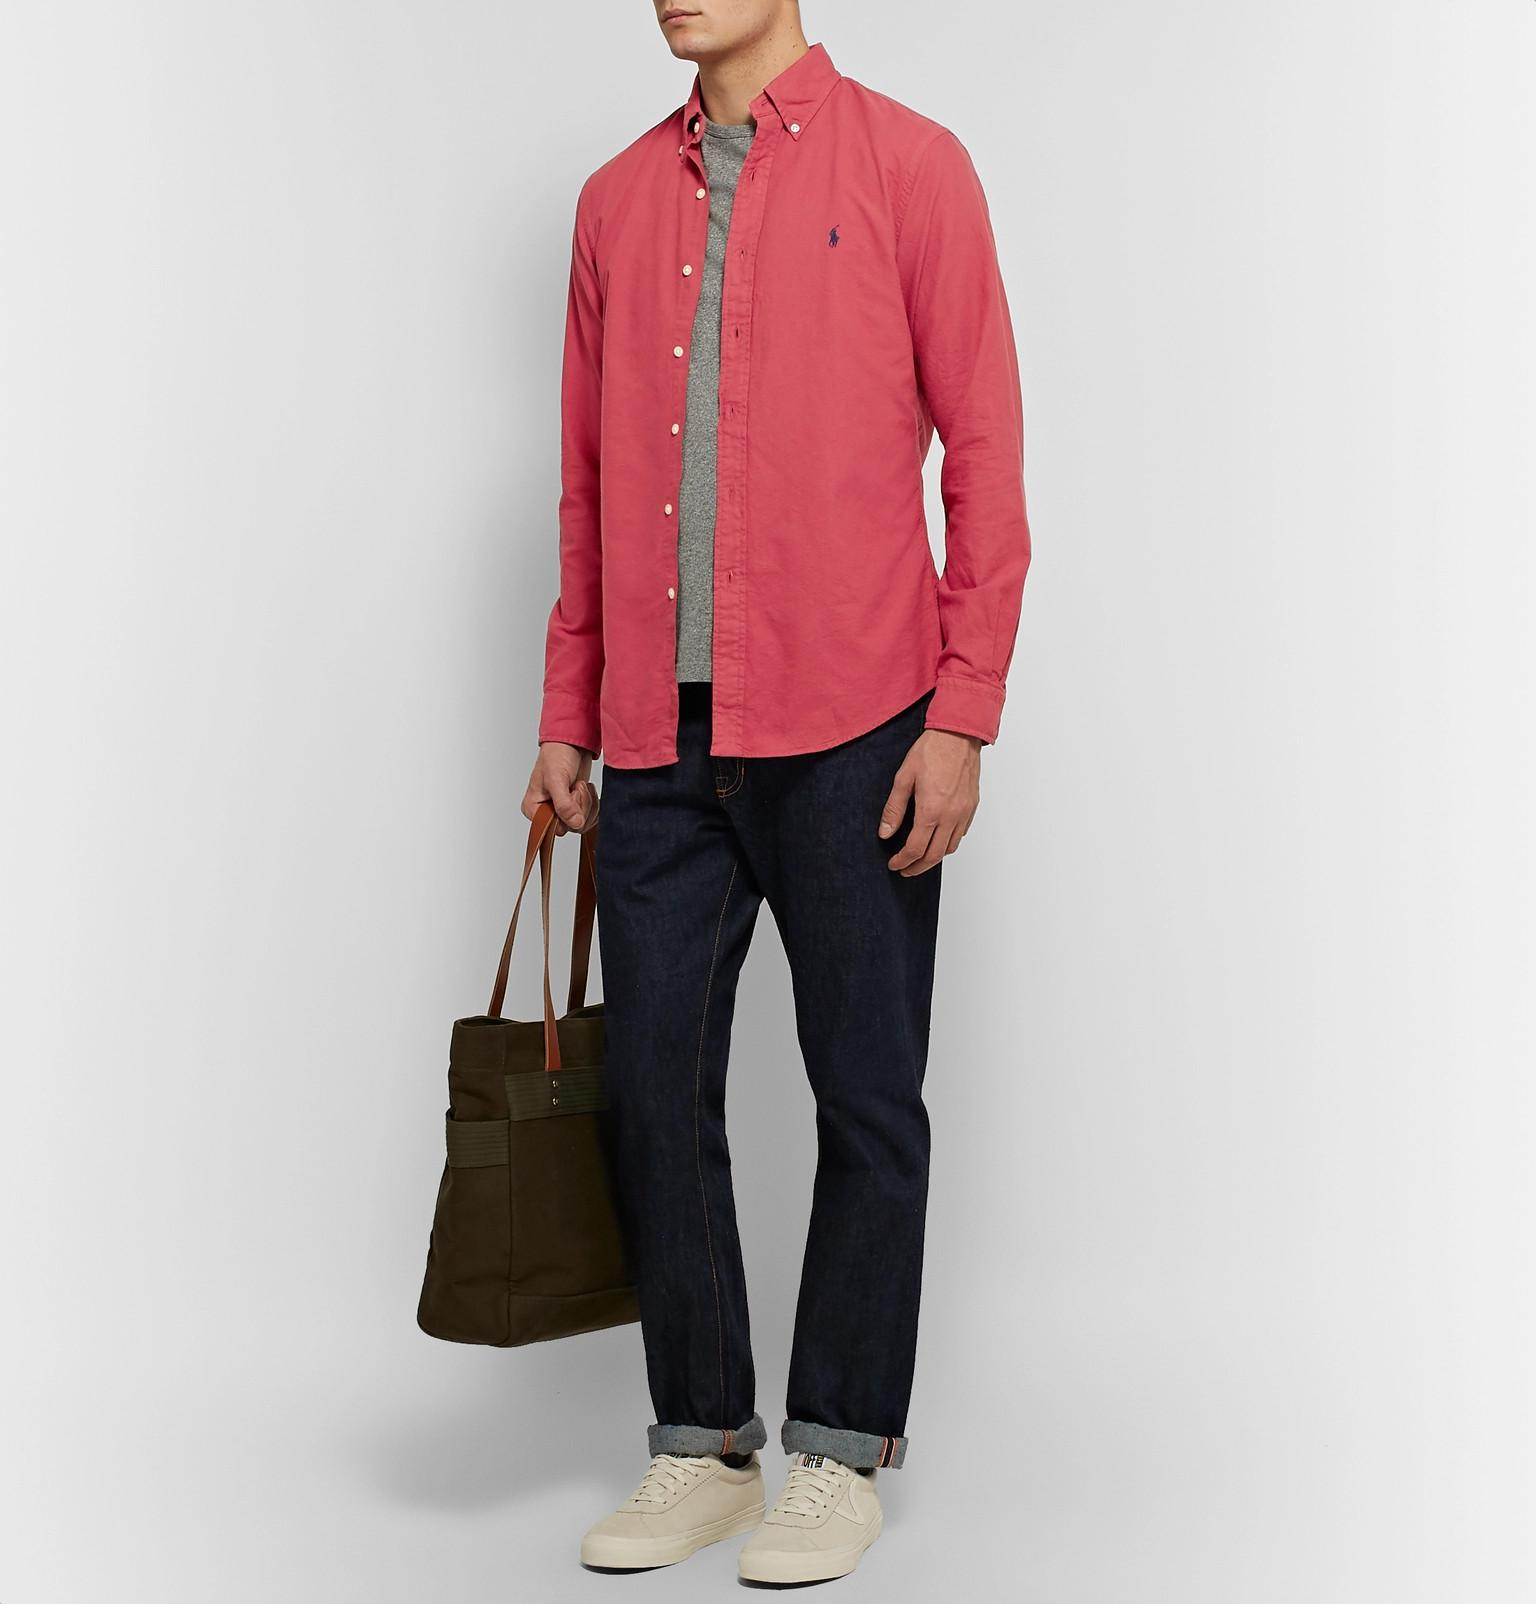 6364abeb3f8 Polo Ralph Lauren - Red Slim-fit Button-down Collar Garment-dyed Cotton.  View fullscreen